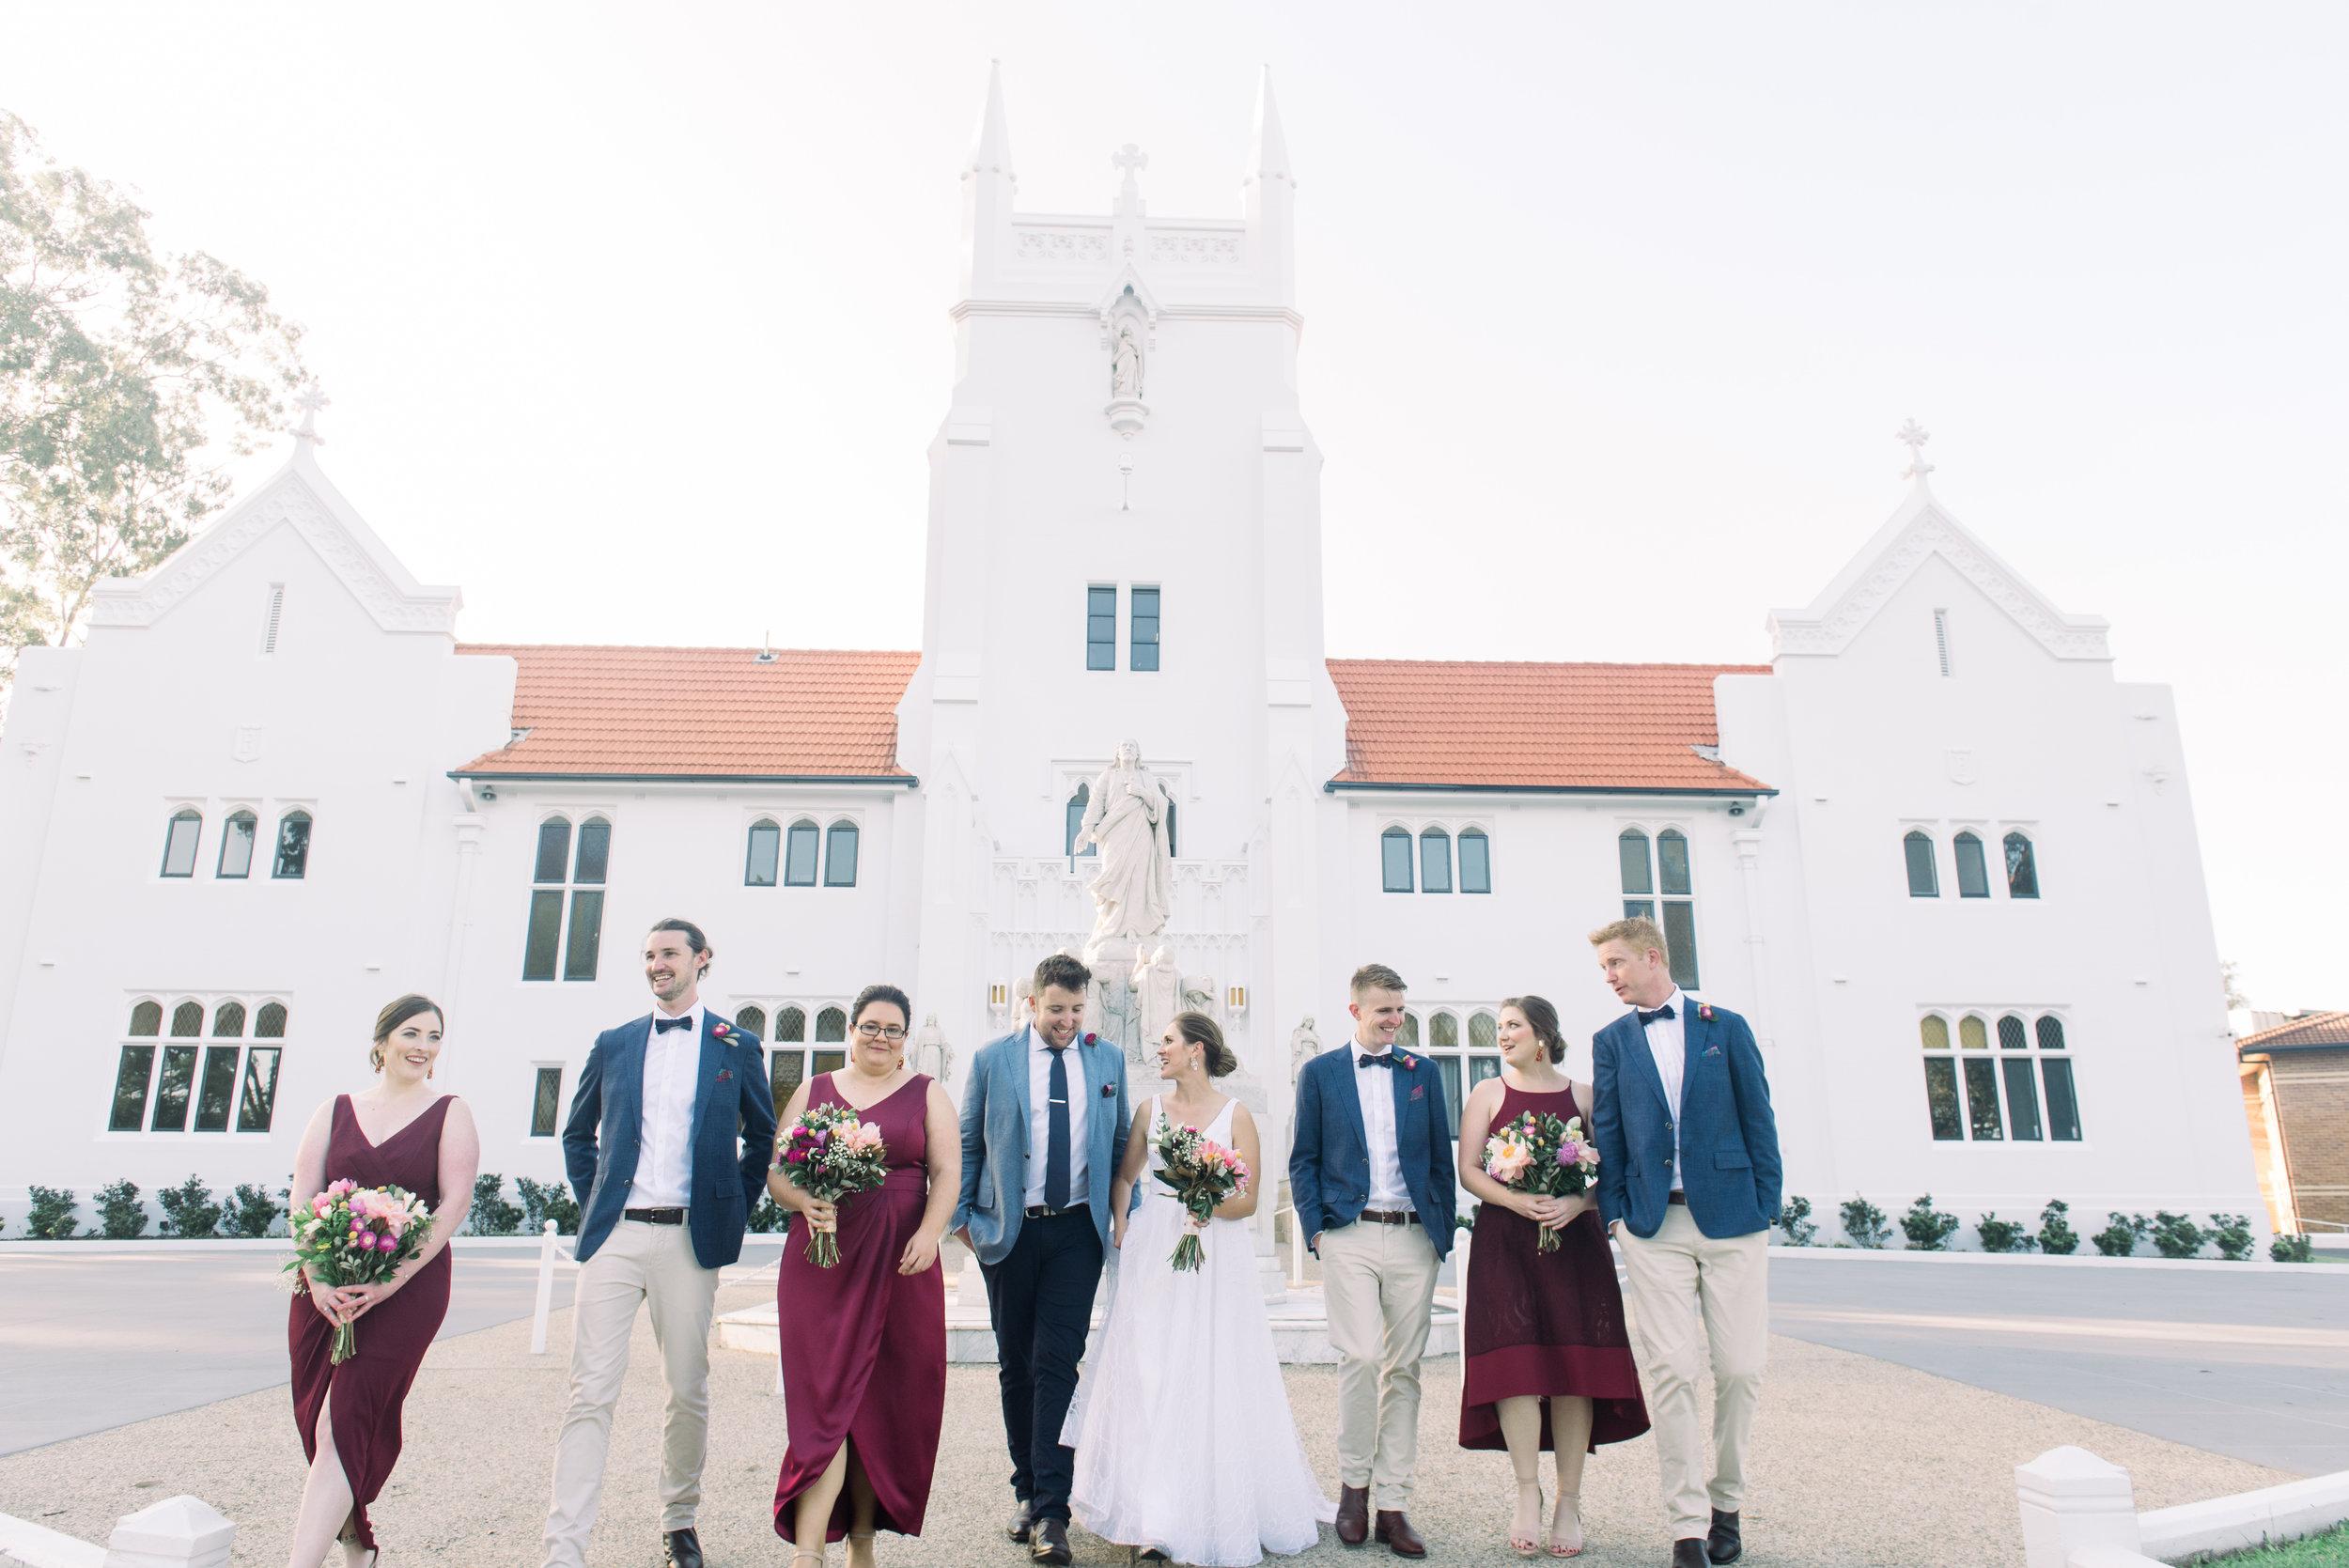 refinery-wedding-brisbane-city-wedding-photographer-66.jpg